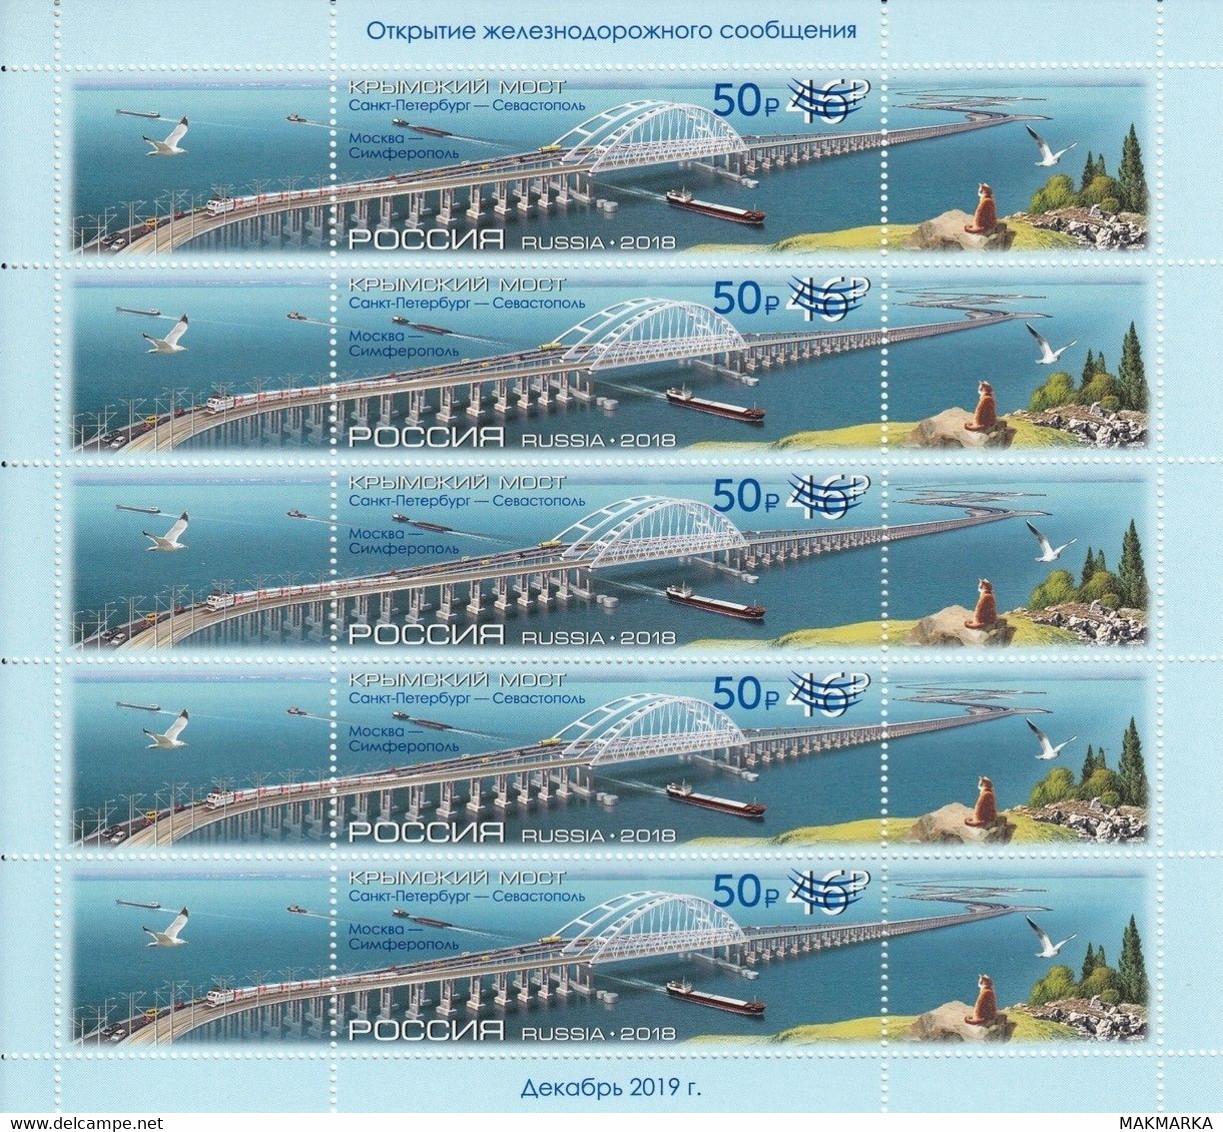 MAKMARKA RUSSIA 2019.12.23 MIH.2805 CRIMEAN BRIDGE (overprint Start Of Rail Traffic) MNH ** ATTENTION CAT! - Blocks & Sheetlets & Panes